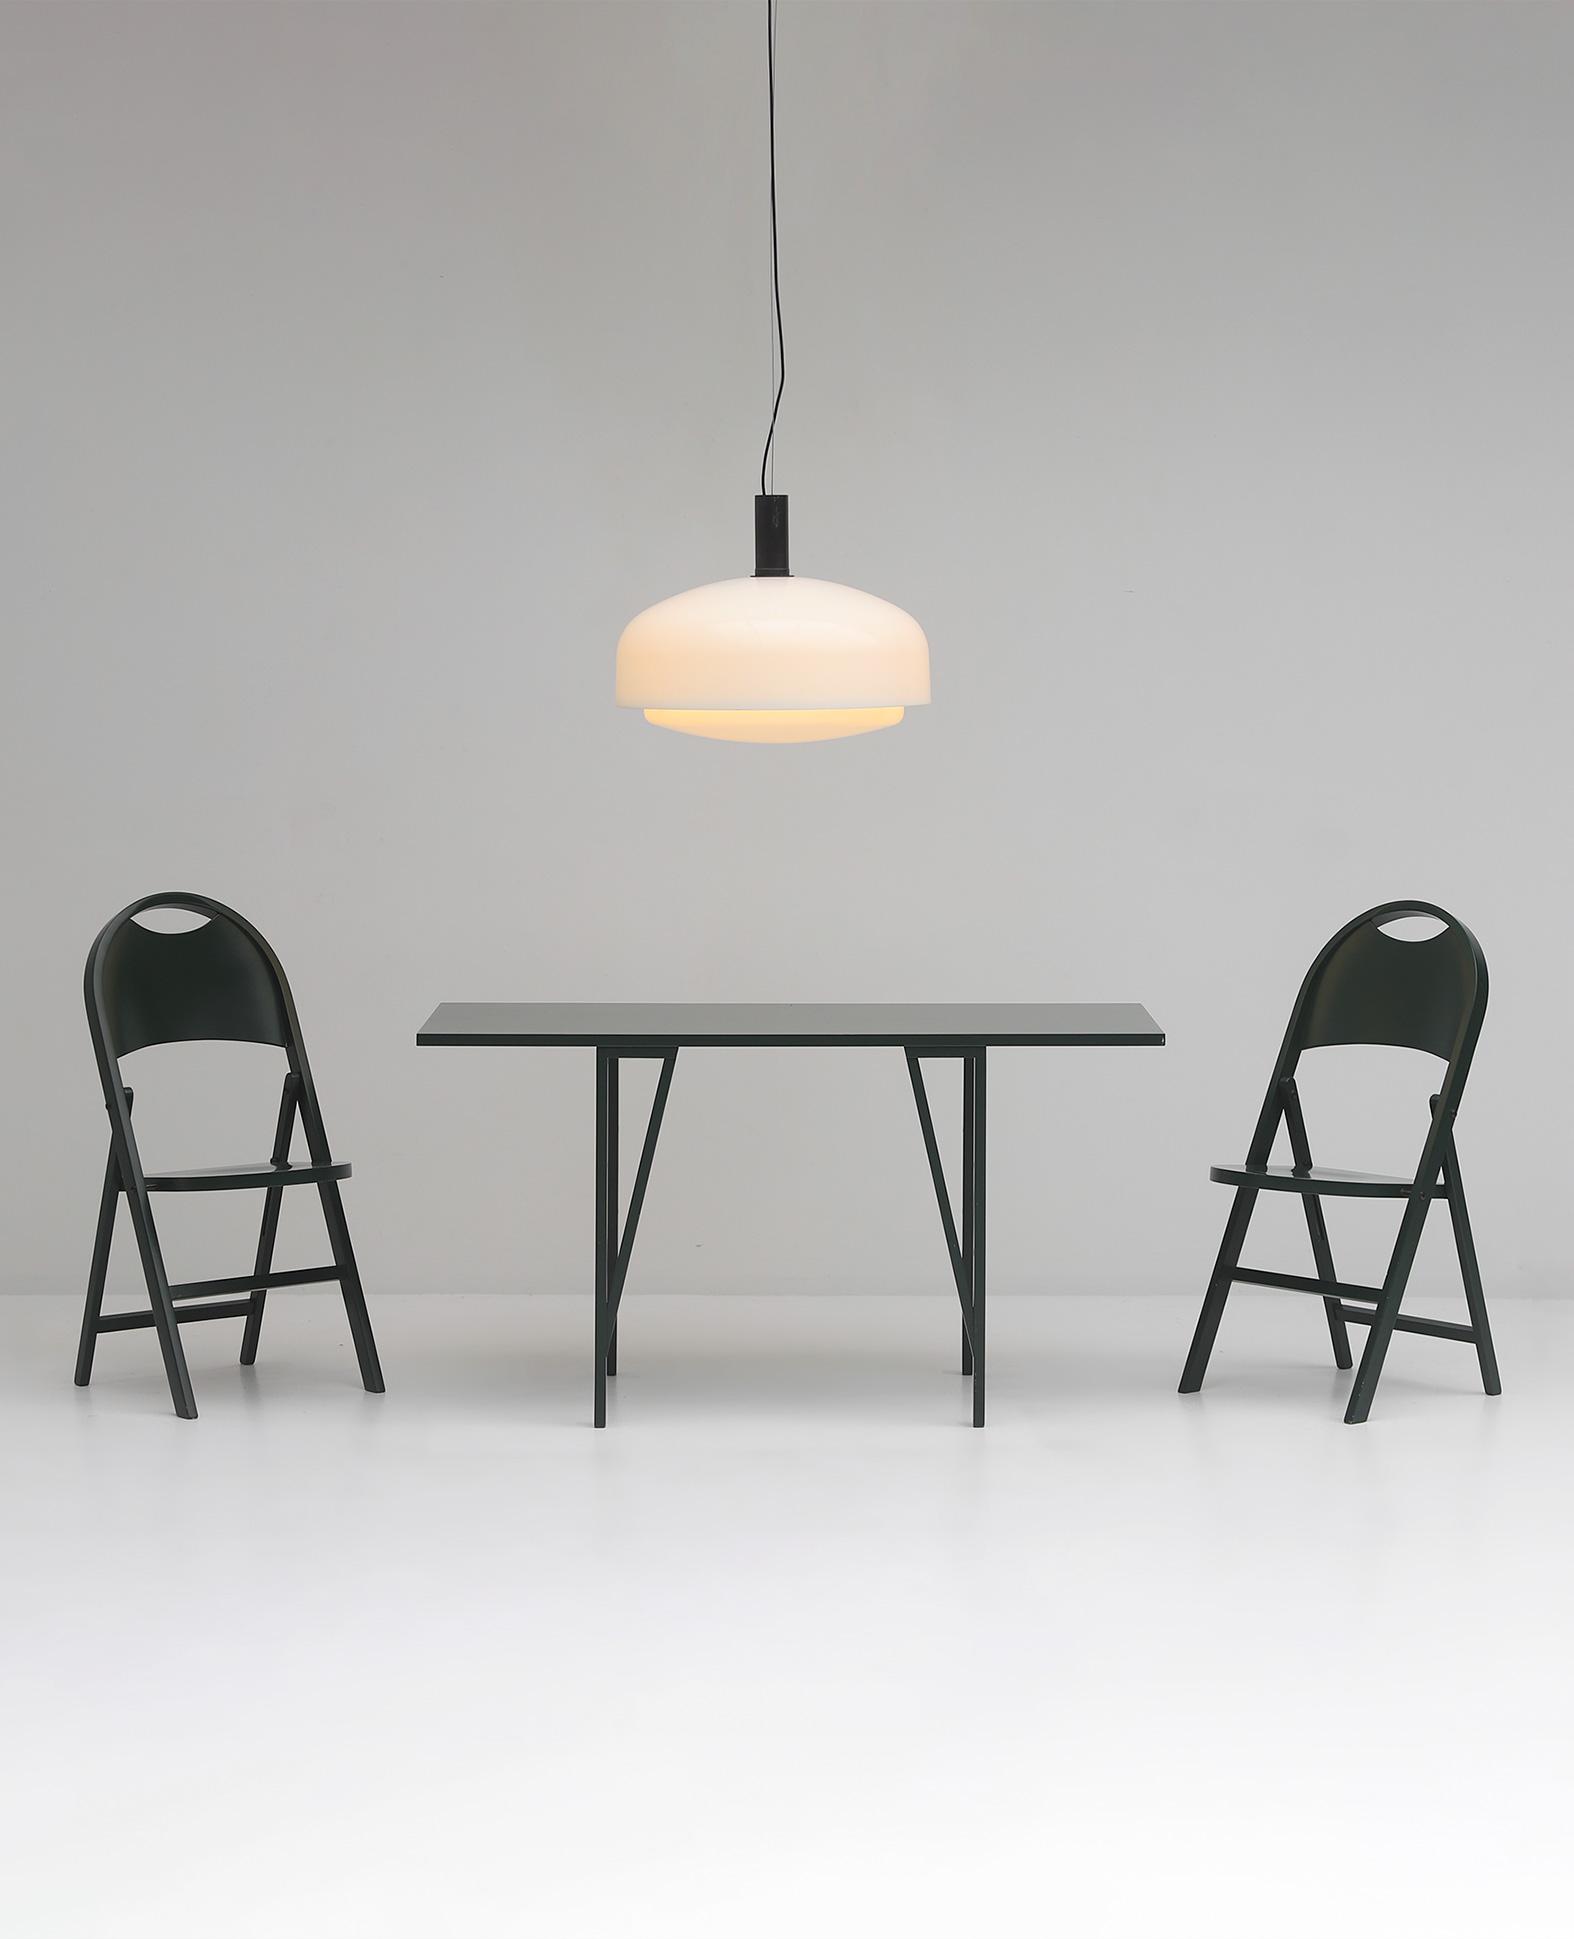 Eugenio Gentile Kartell kd62 Pendant Lamp image 6